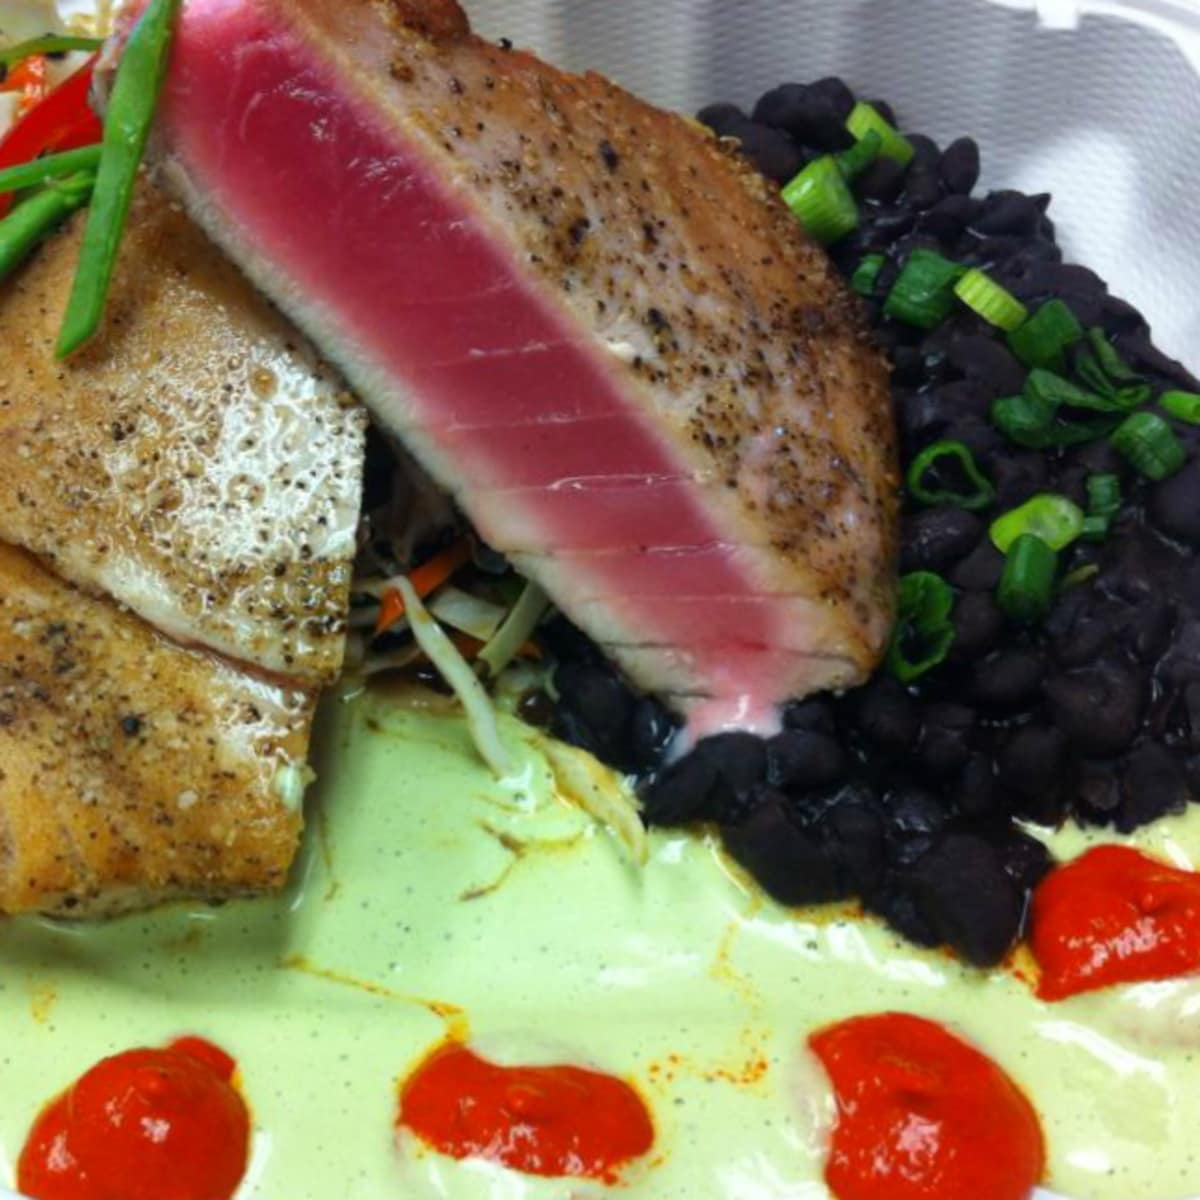 Irie's Island Food Port Aransas restaurant seared tuna dish 2015